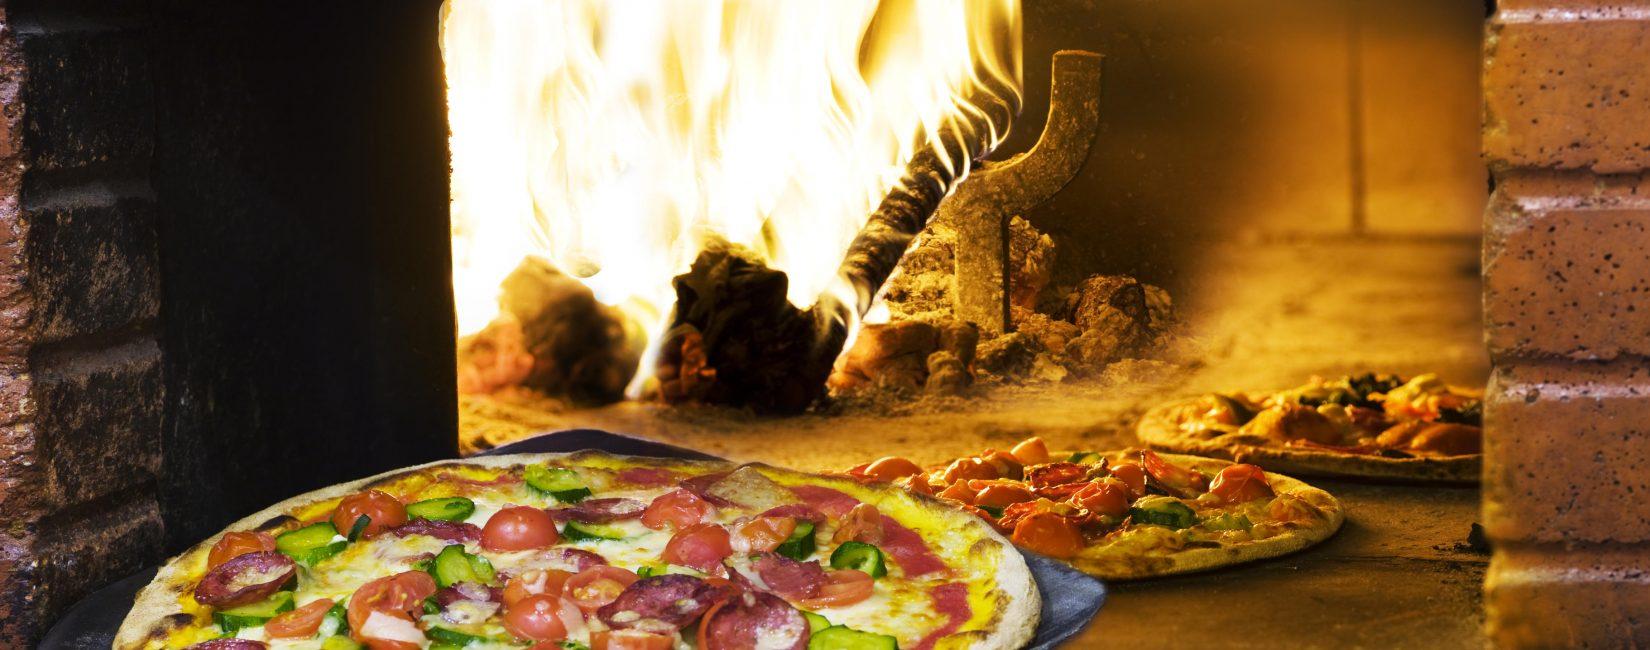 Pizza frisch aus den Holzofen ...